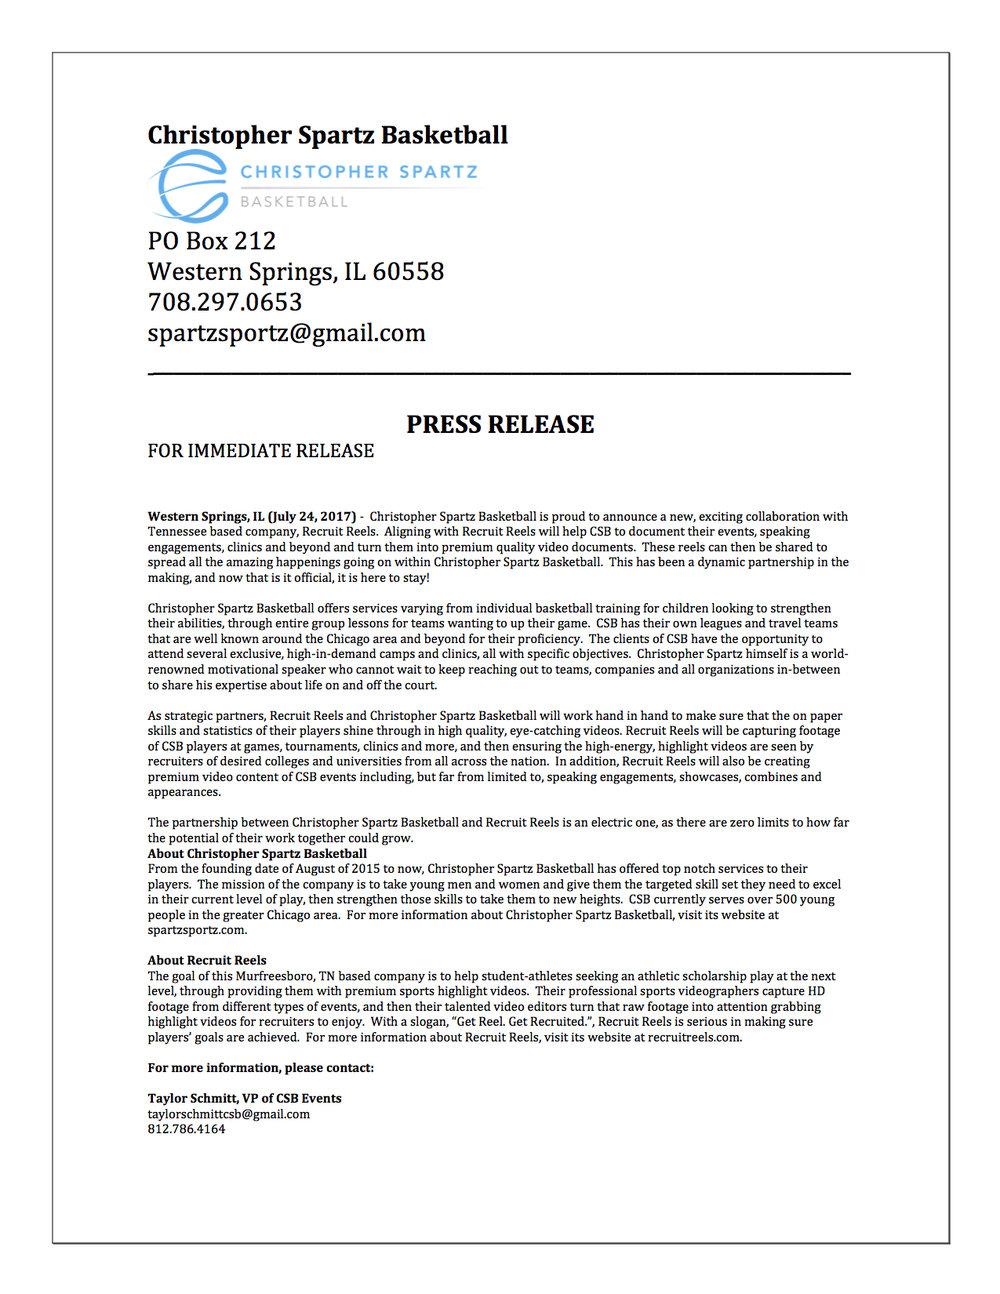 CSB & RECRUIT REELS PRESS RELEASE.jpg